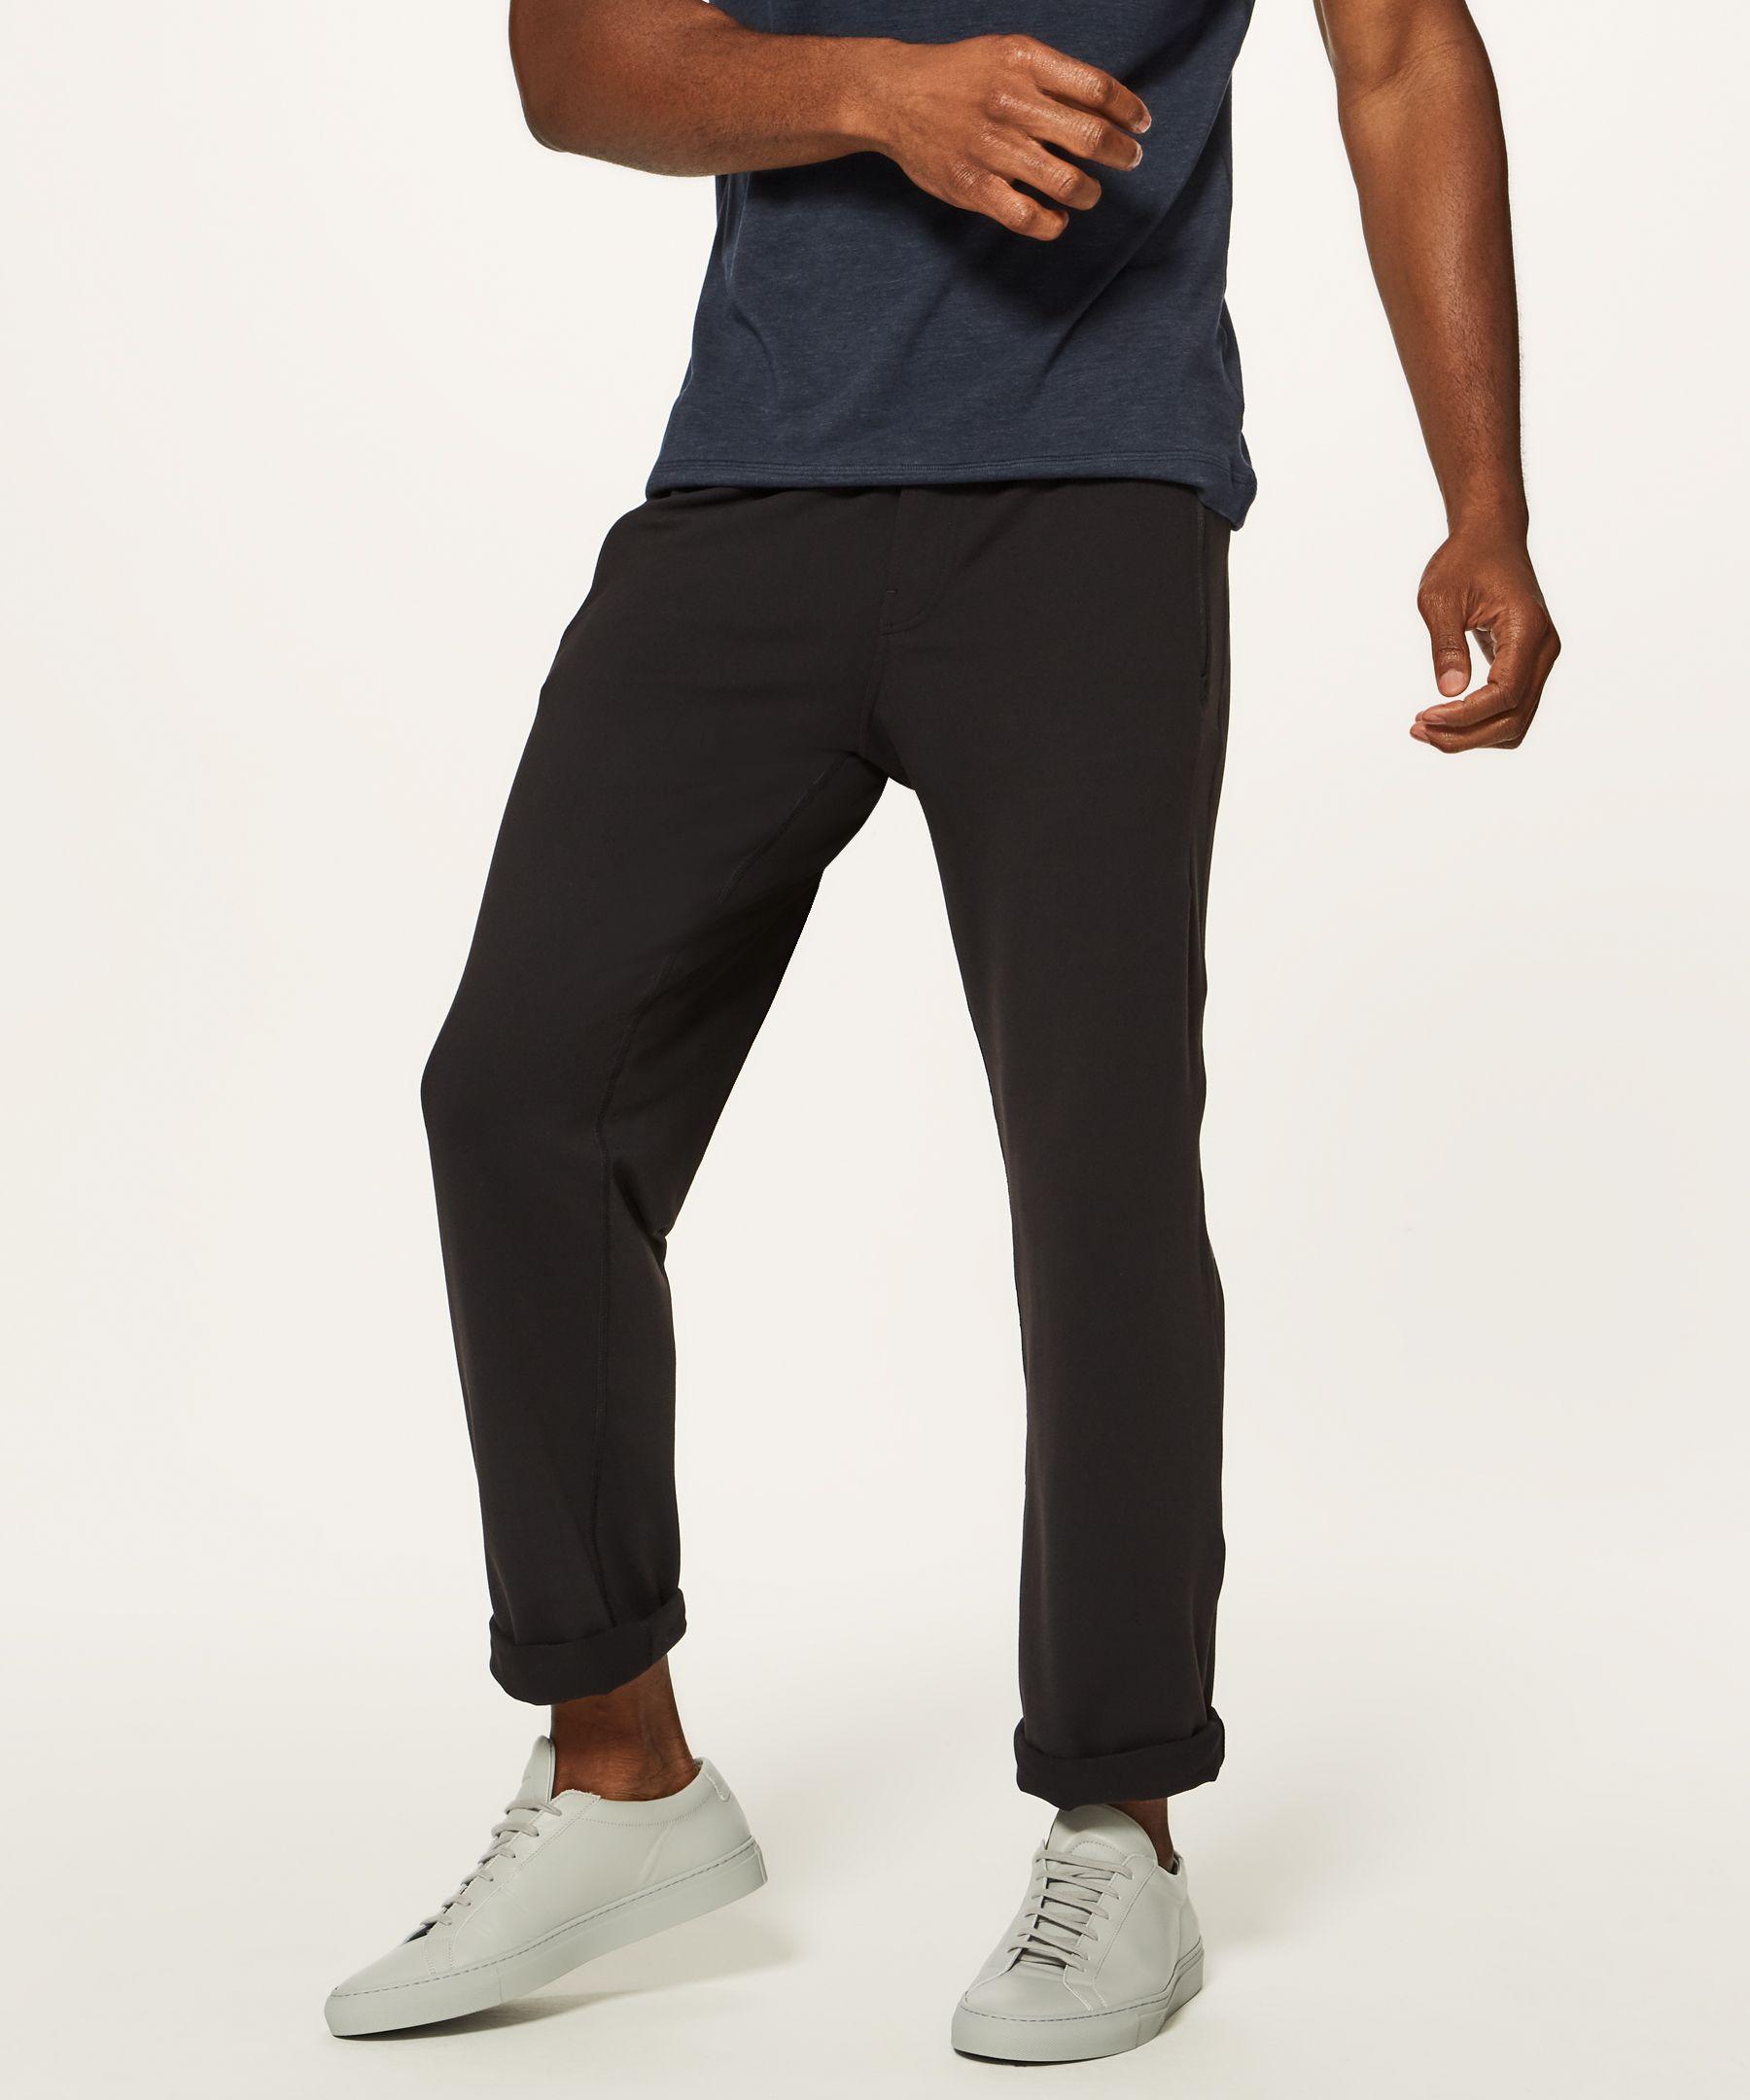 Discipline Pant (Regular)